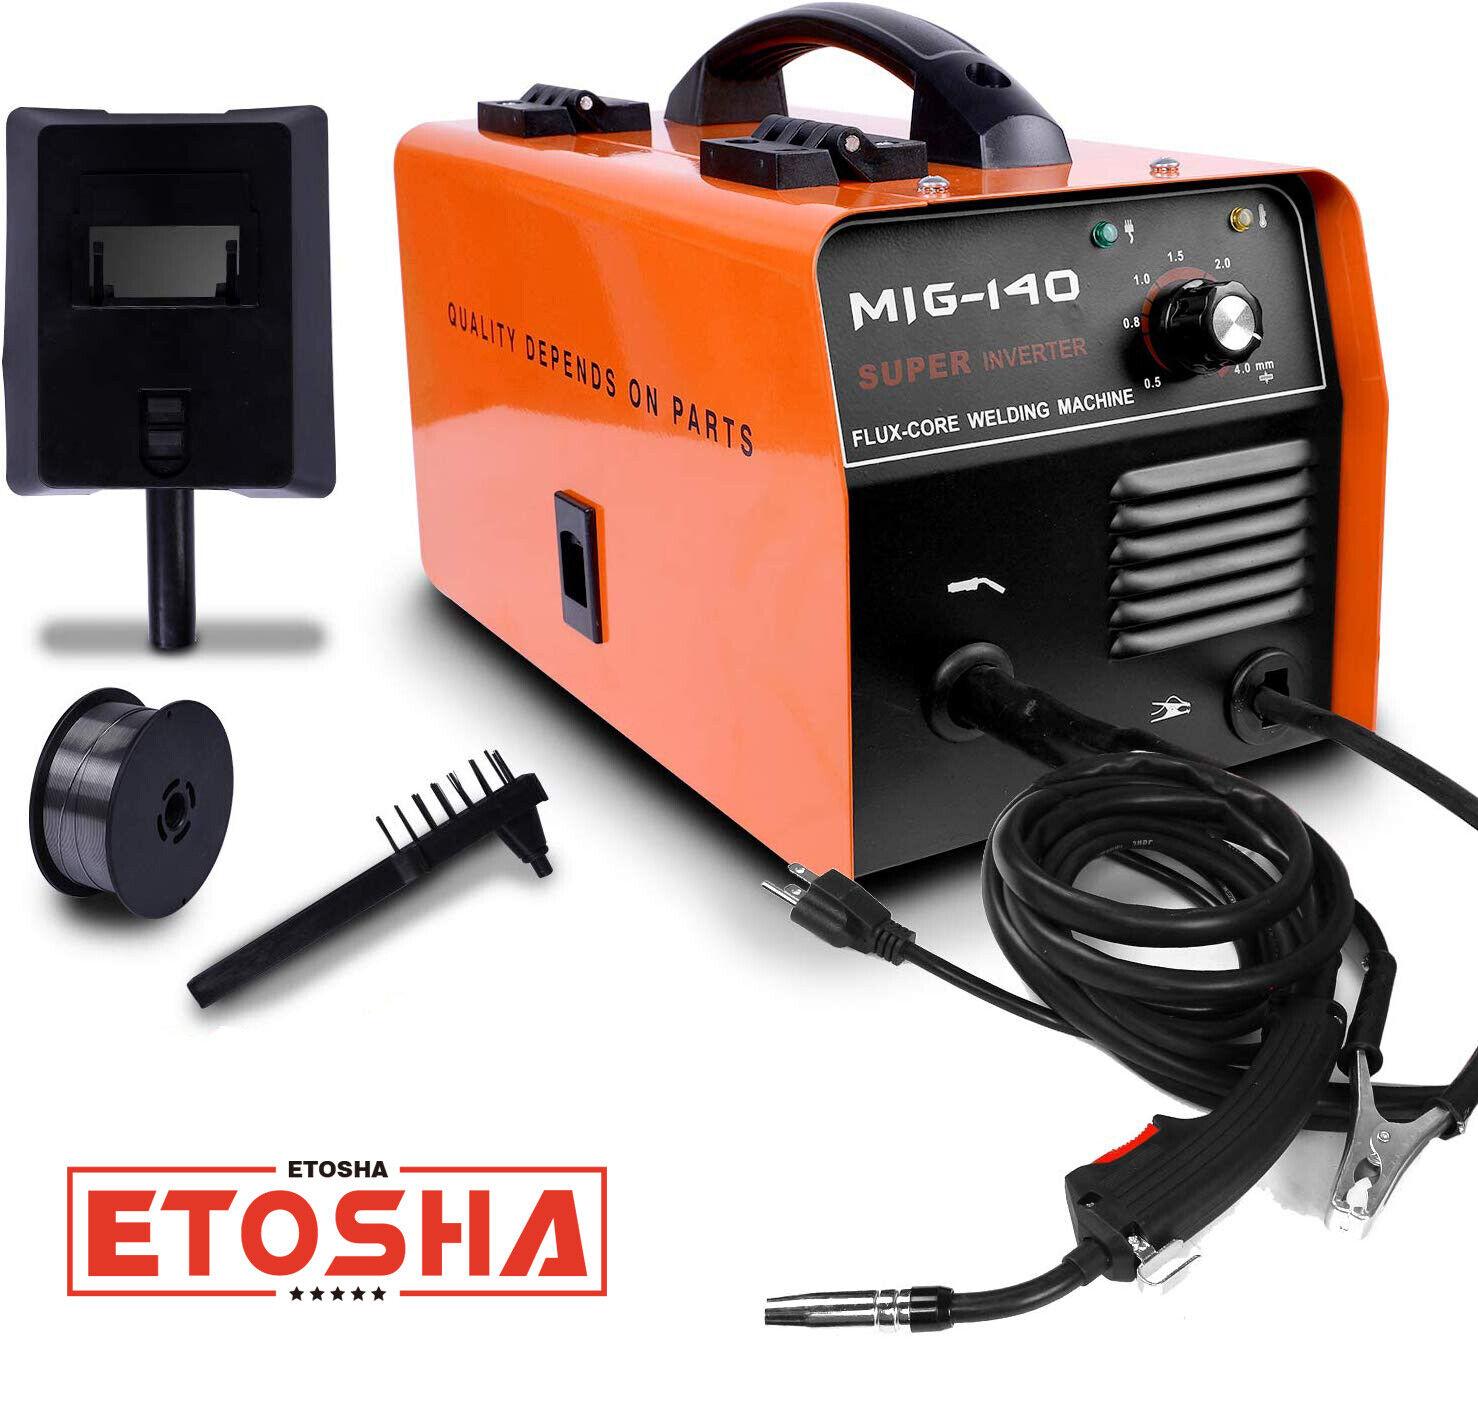 USAM-ETEW001 shopkeeper-usa 140 MIG Welder AC Flux Core WIre Gasless Automatic Feed Welding Machine w/Mask